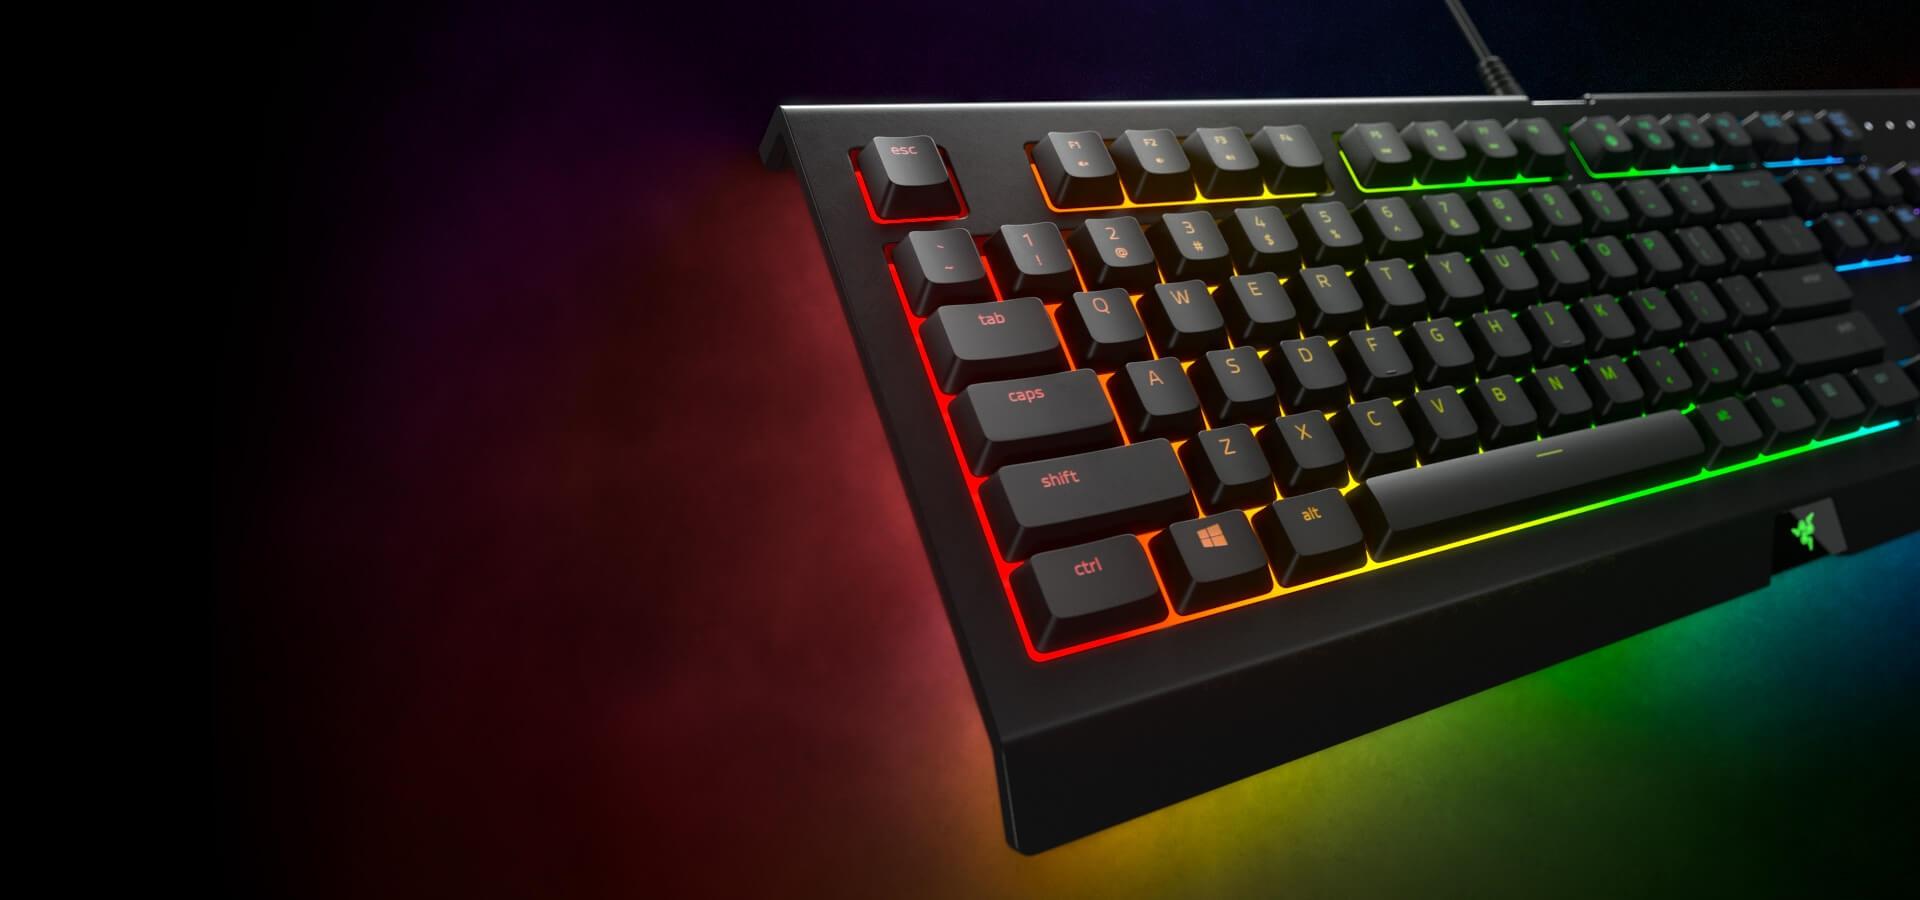 Razer Cynosa Chroma Multi-color Gaming Keyboard